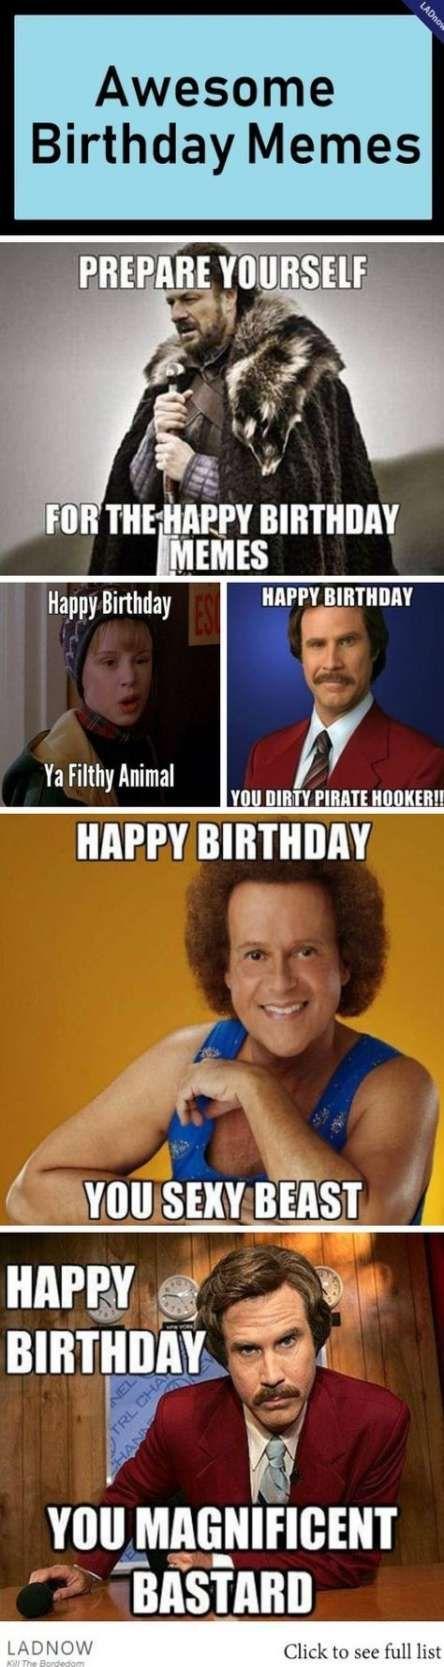 42 Ideas For Birthday Meme Humor Funny Funny Birthday Meme Birthday Meme Birthday Humor